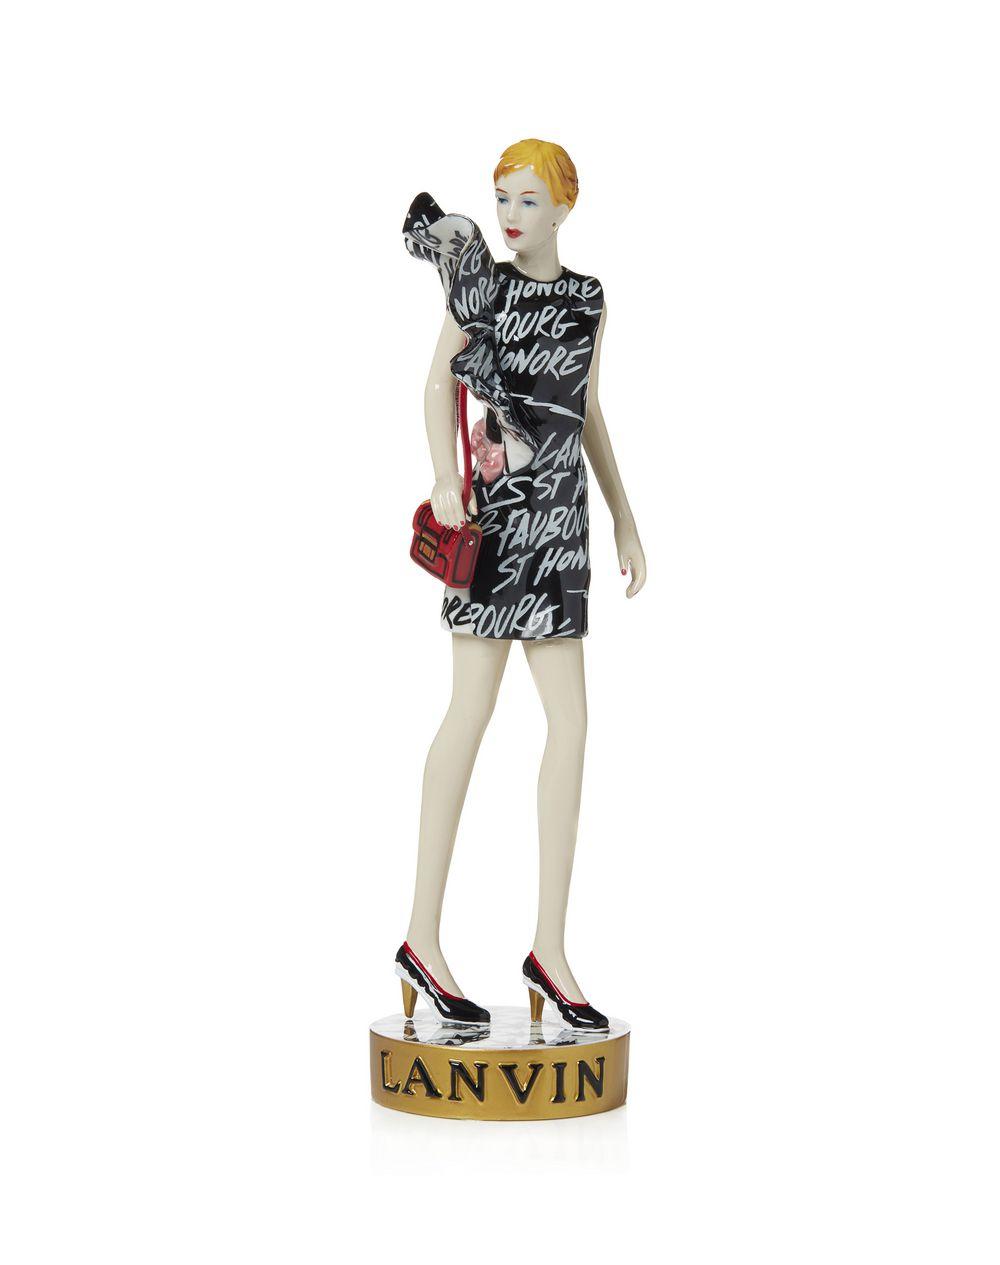 Miss Lanvin 56 - Lanvin